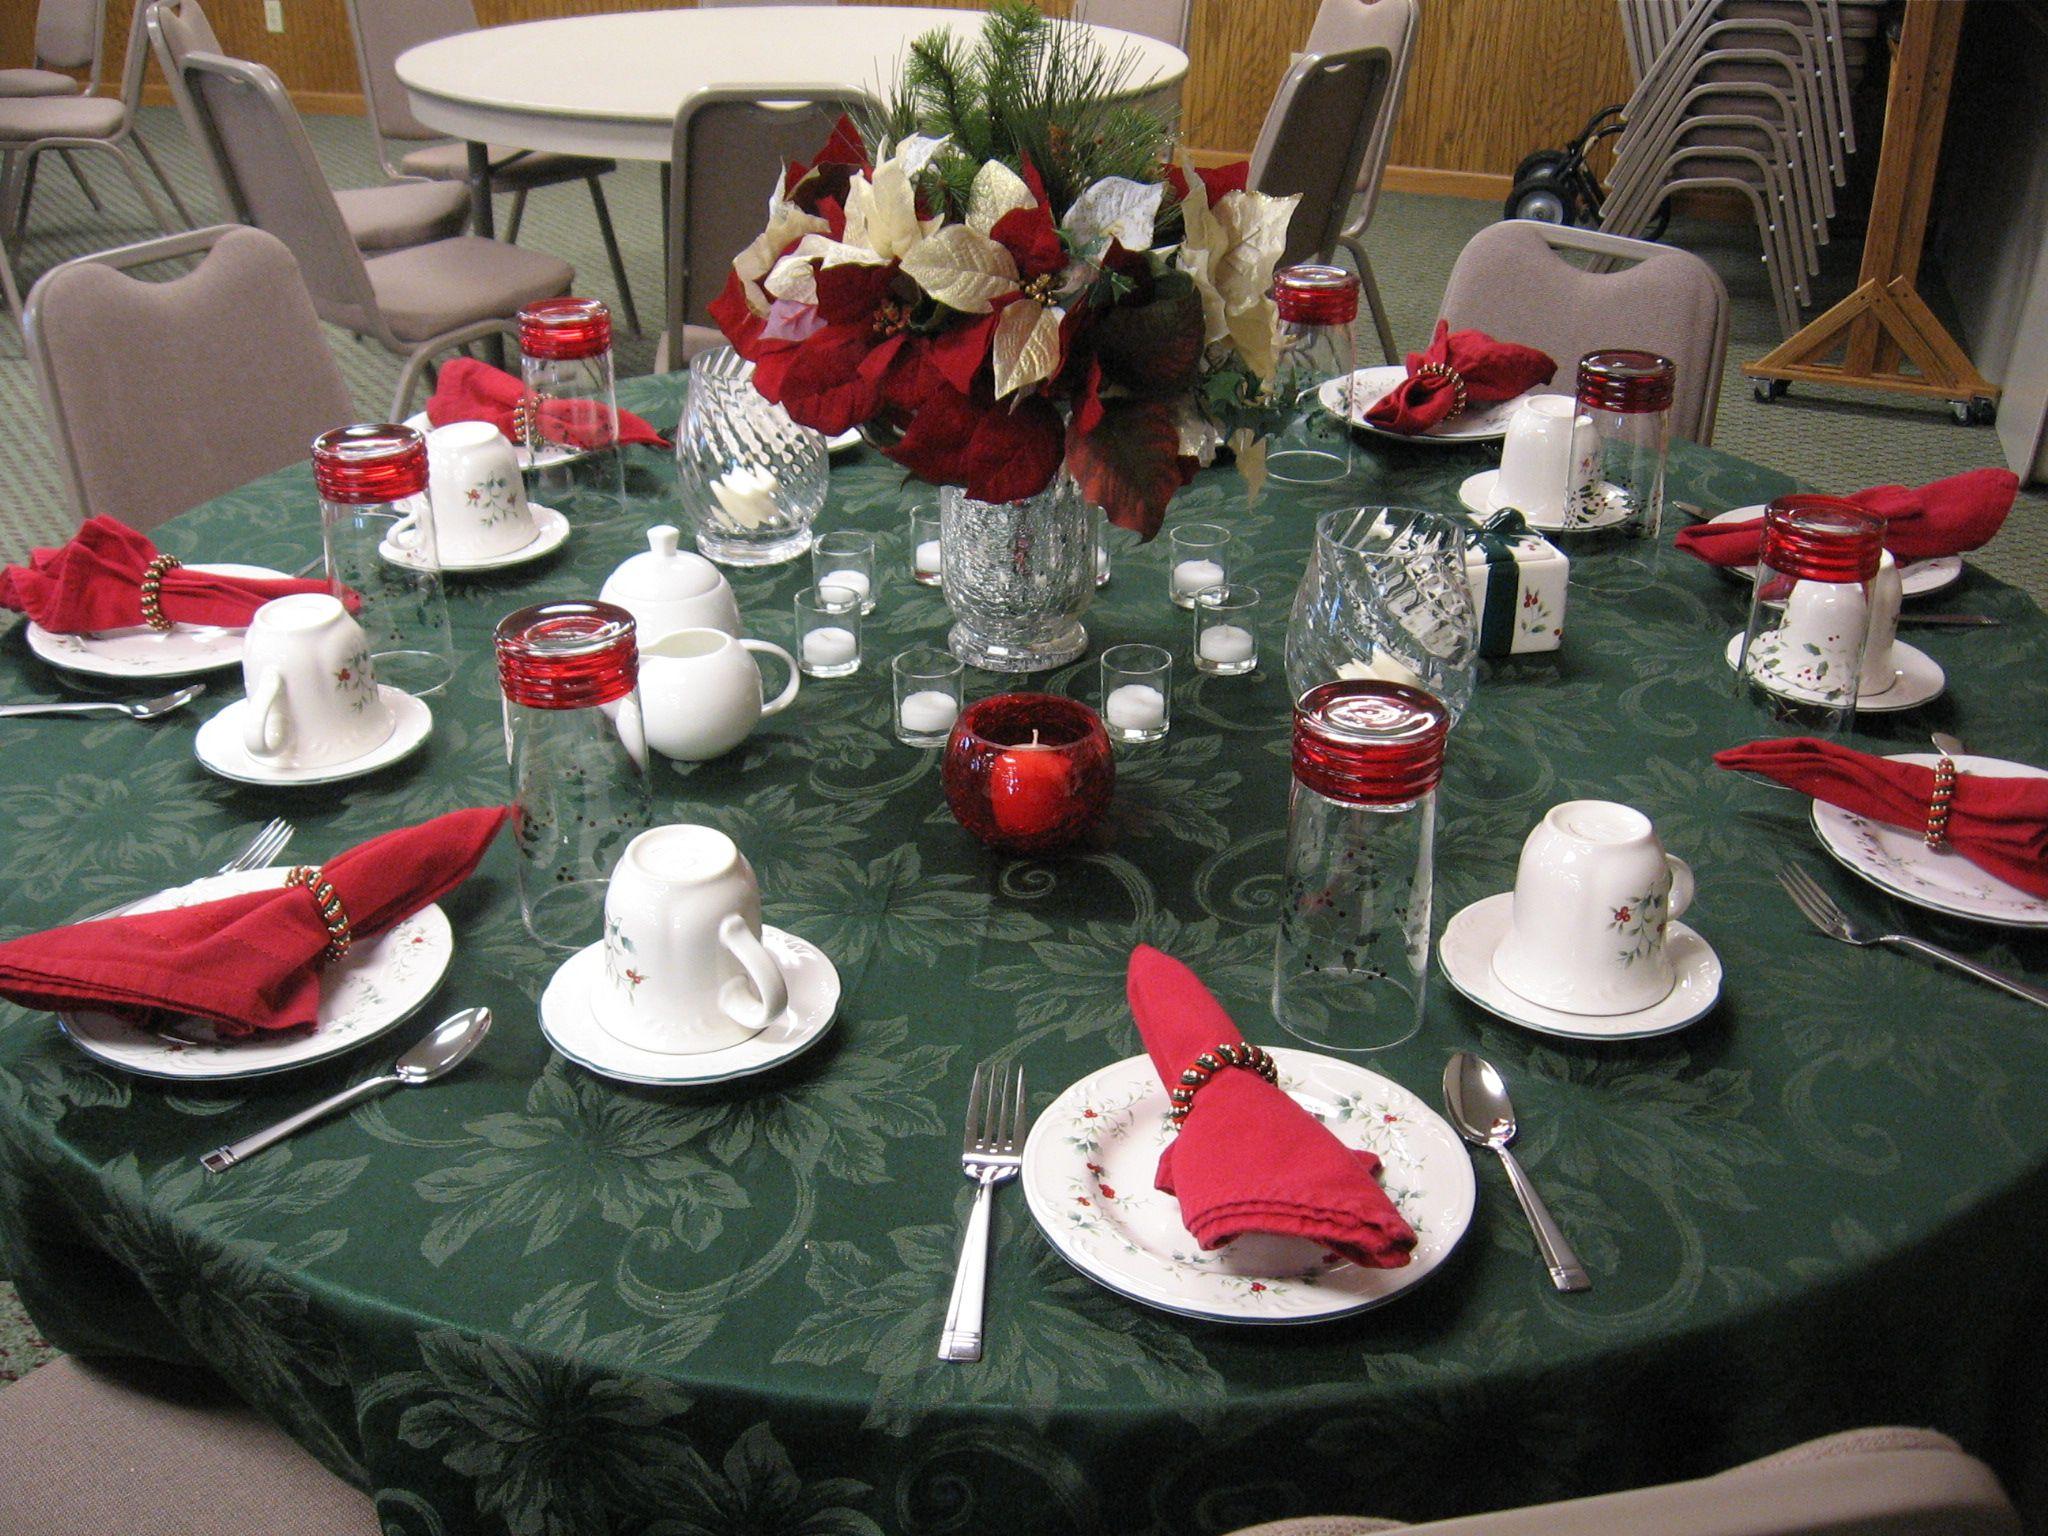 Christmas ladies' tea table Christmas tea party